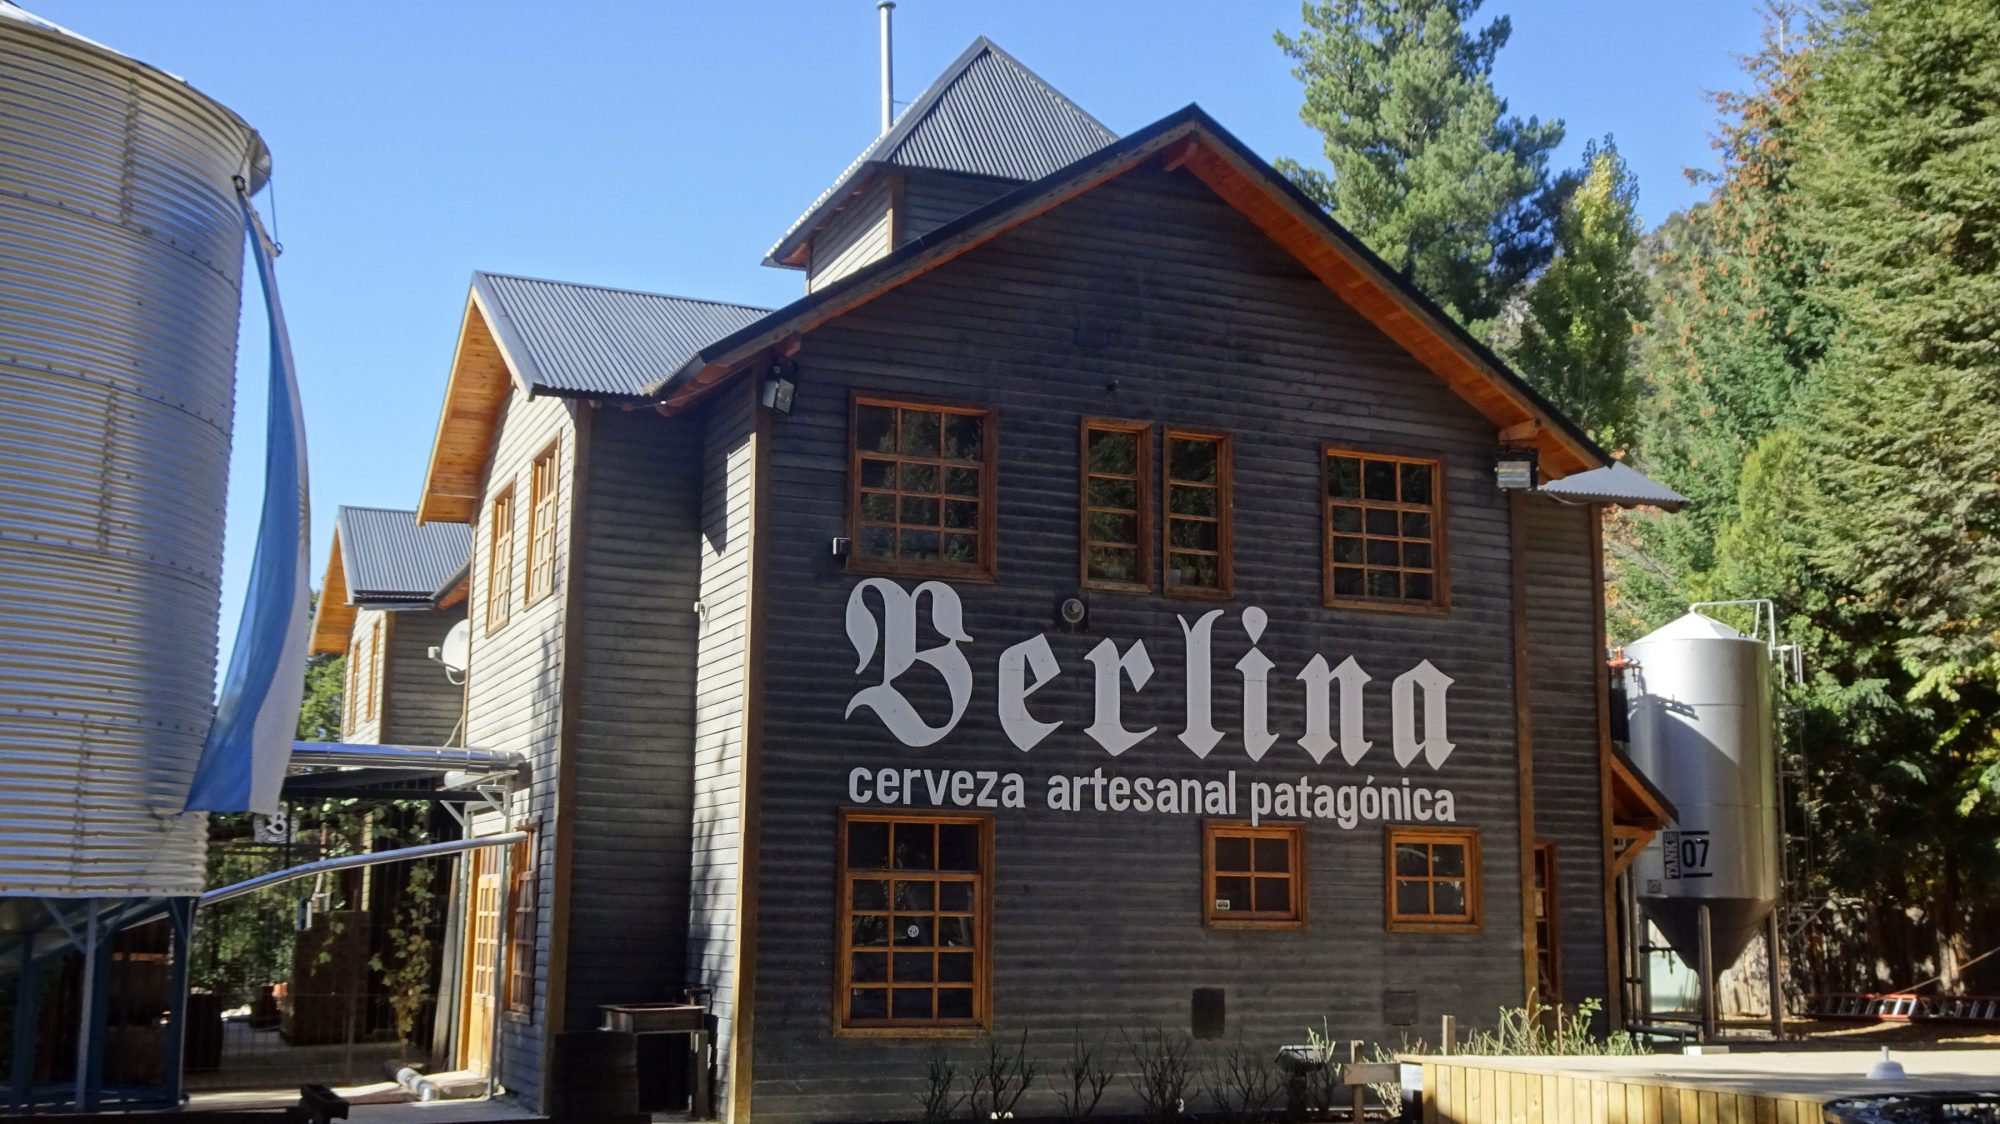 Fjella Bariloche Nahuel-Huapi Traverse Wanderung Wanderroute Refugio Jacob Colonia Suiza Refugio Laguna Negra Patagonien Argentinische Schweiz